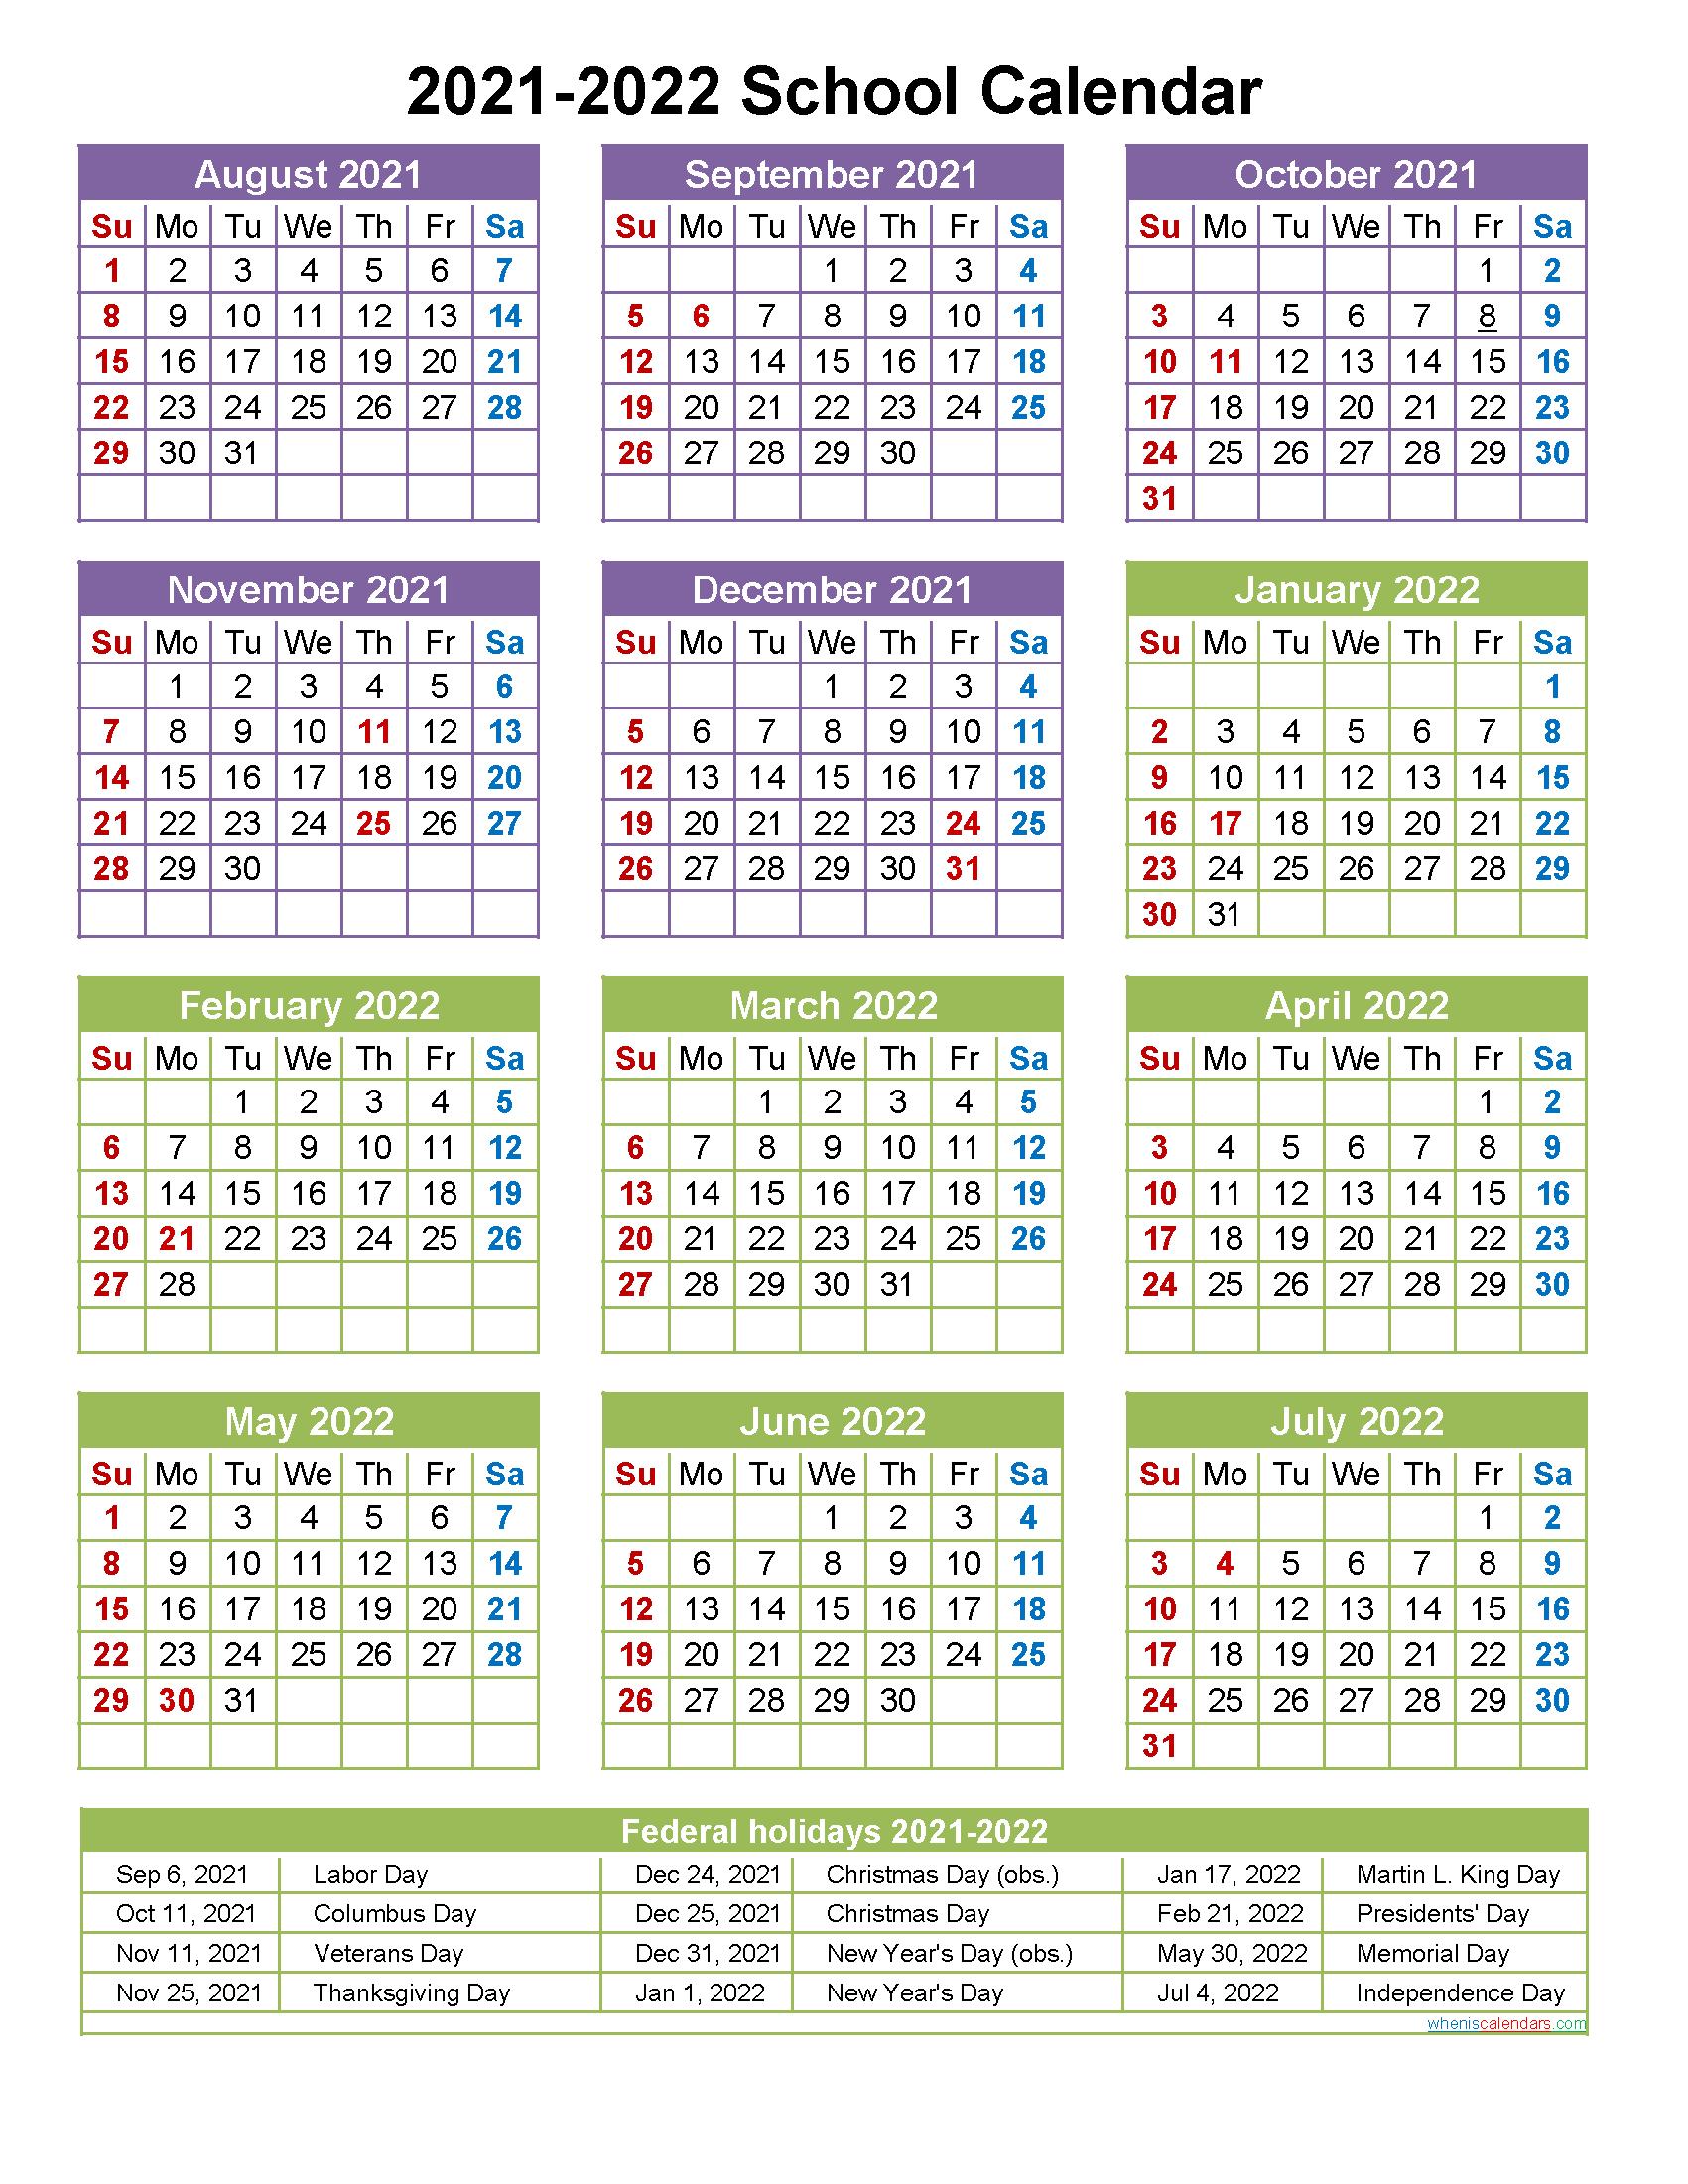 Ccisd Calendar 2021 2022 - April 2021